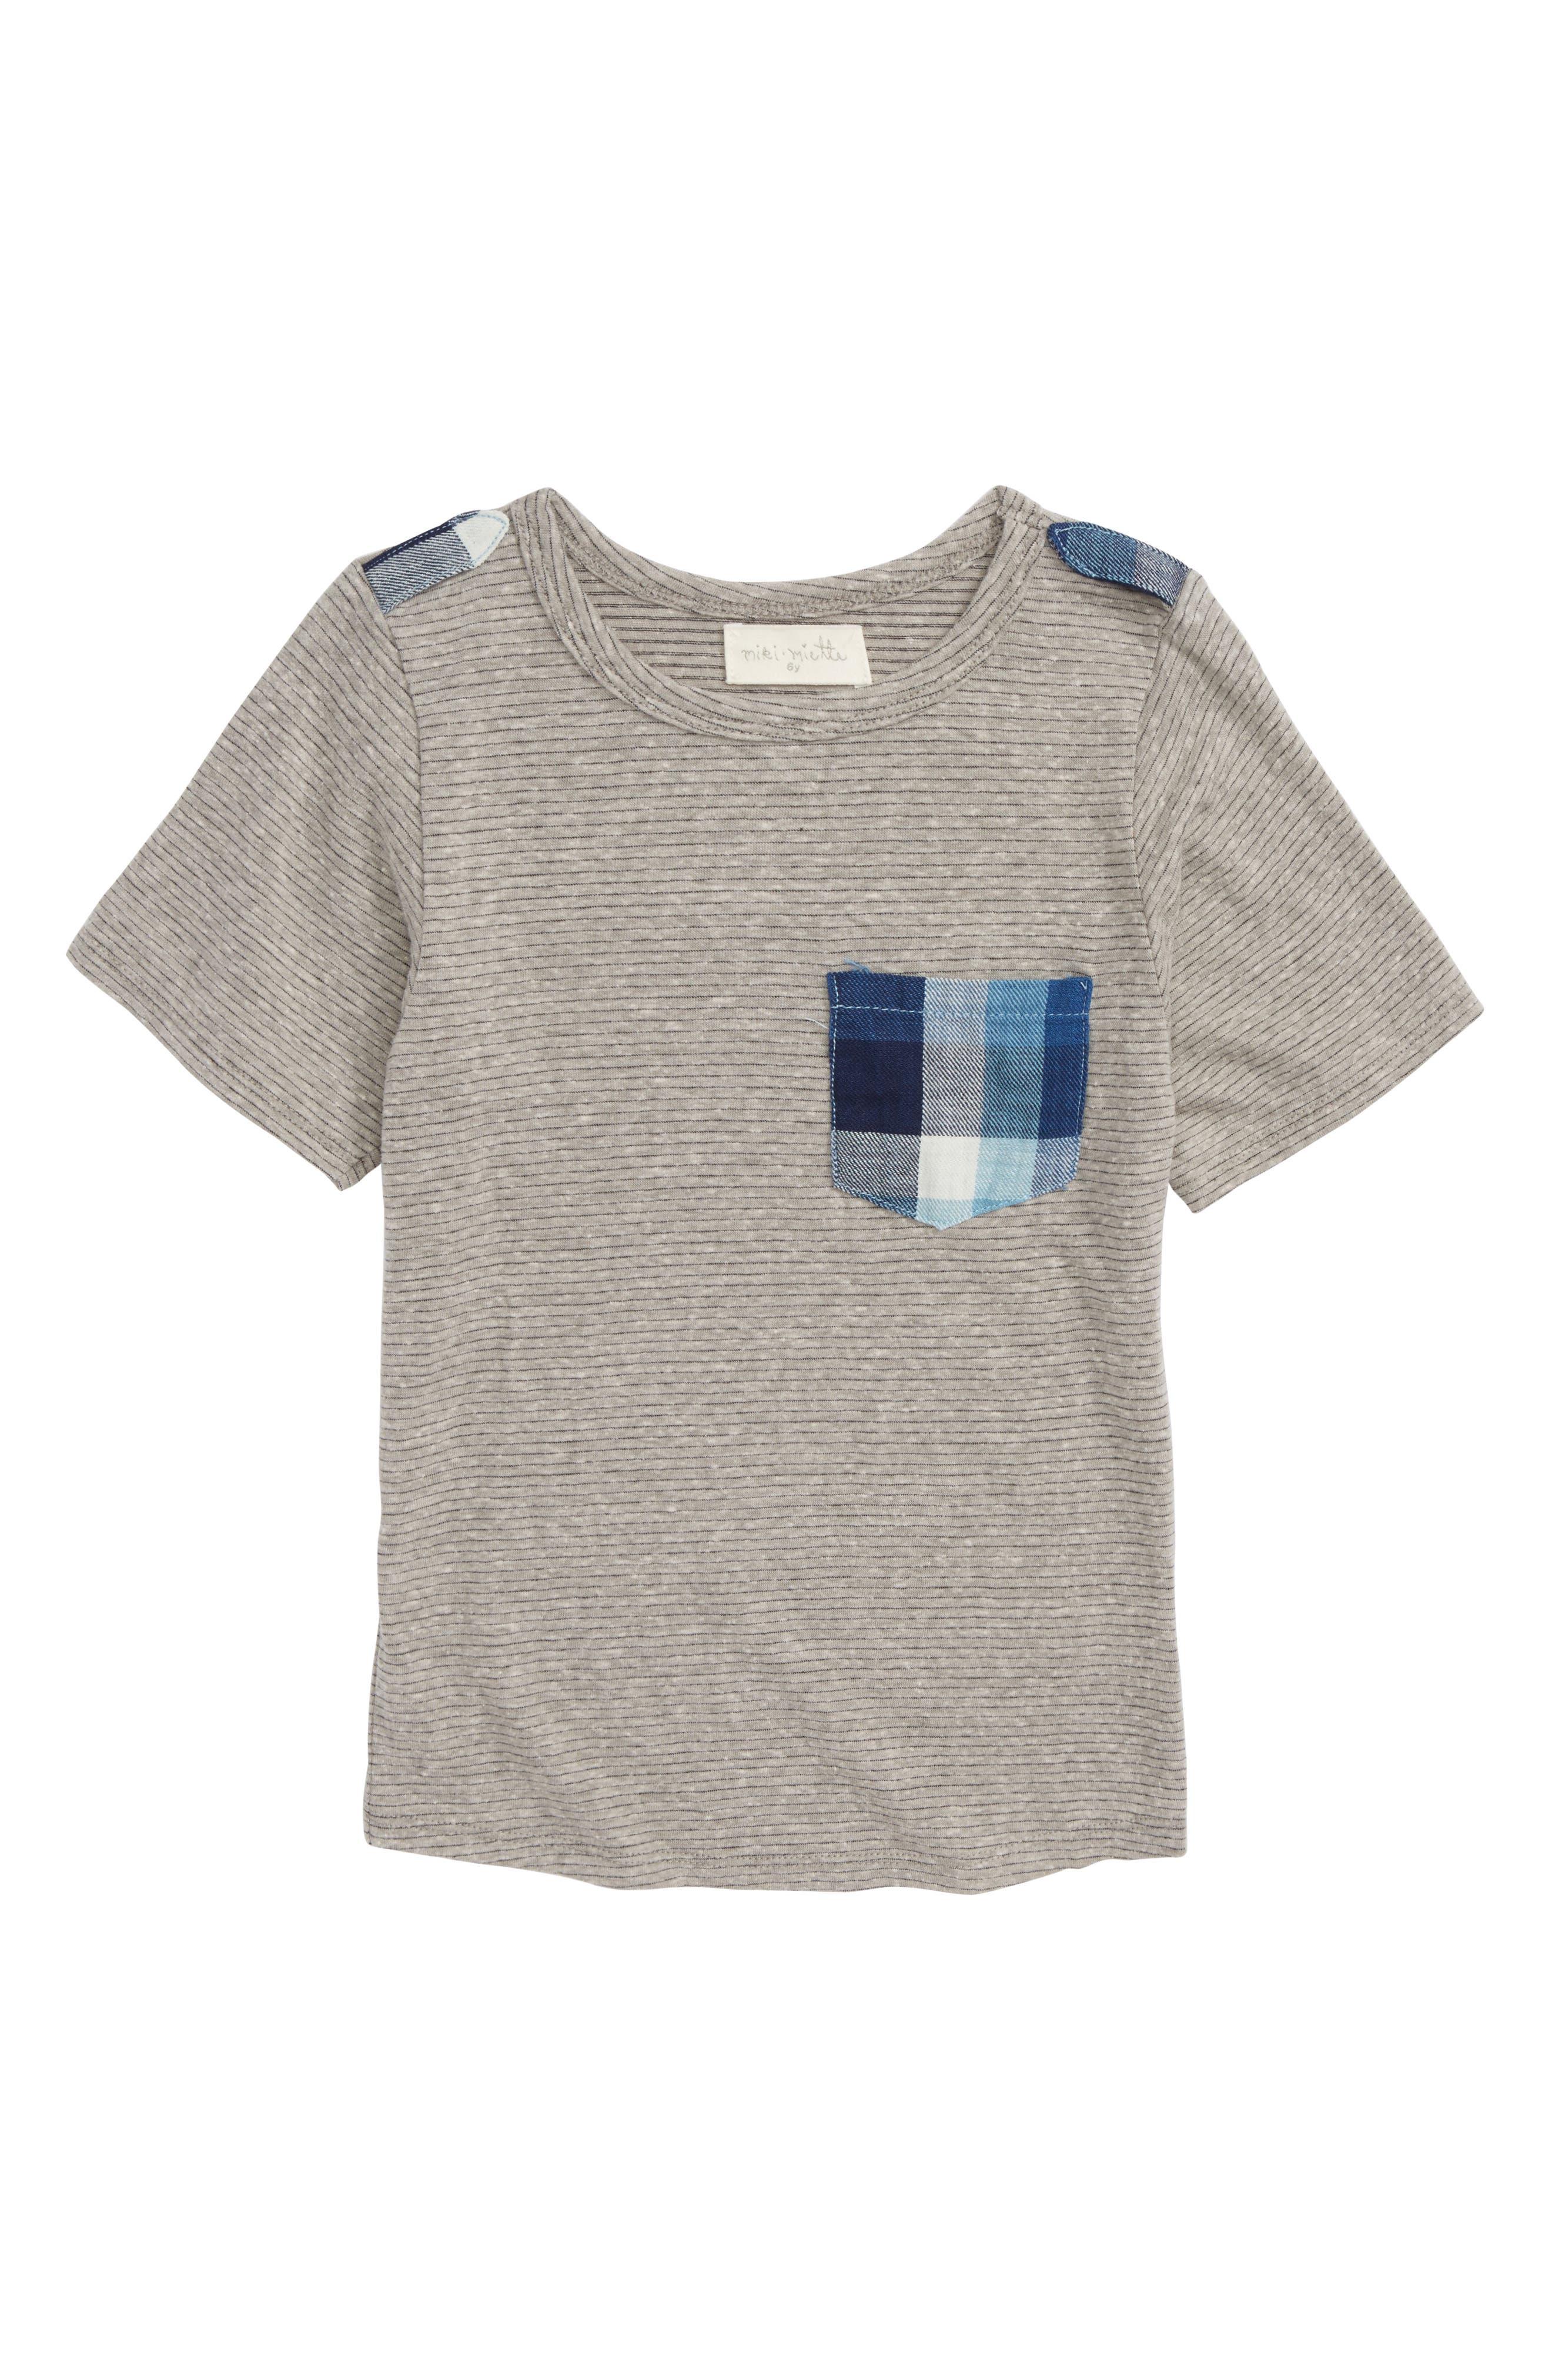 Ranger Pocket T-Shirt,                             Main thumbnail 1, color,                             La Jolla